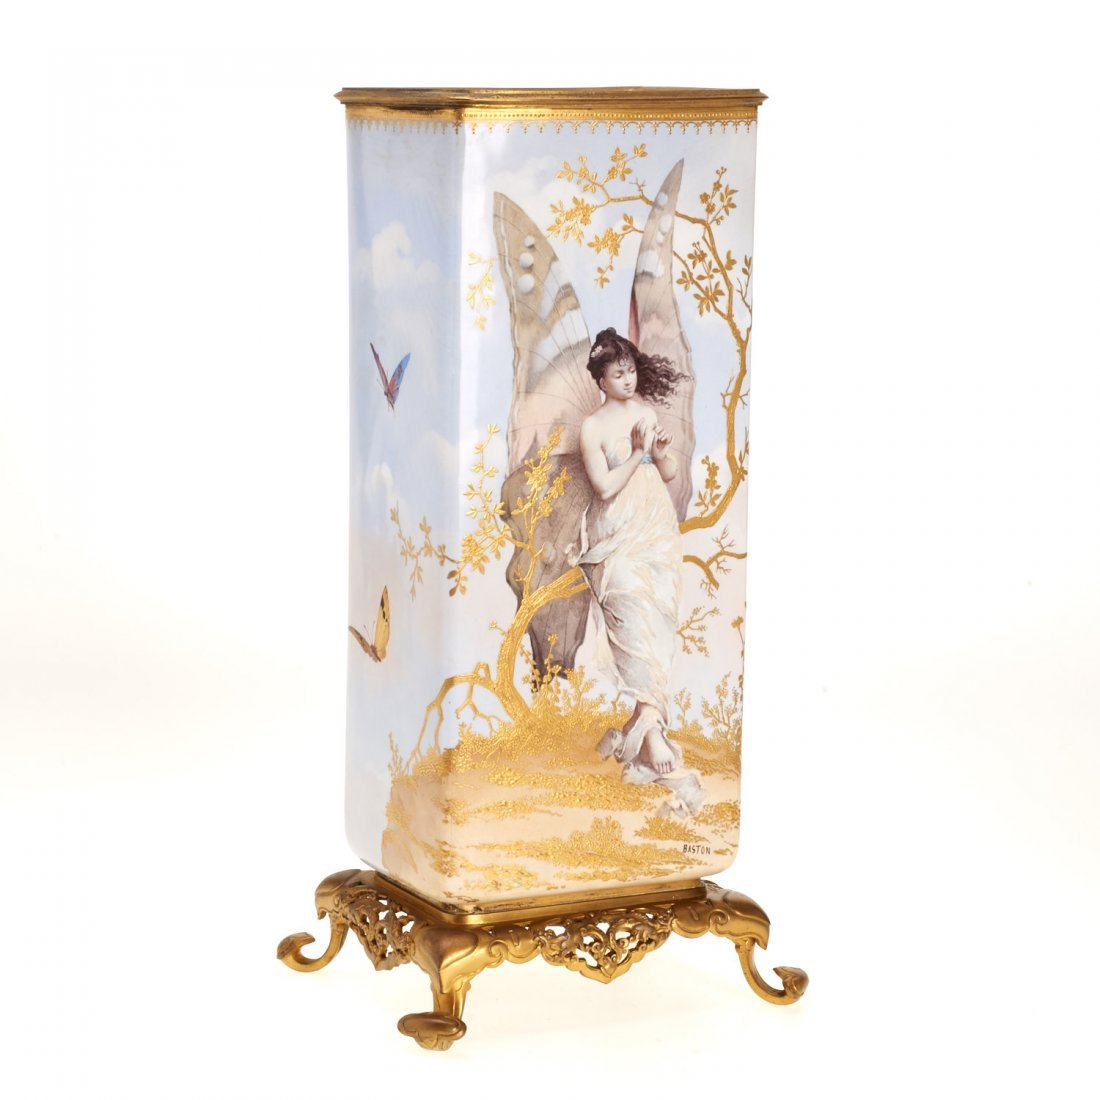 Gilt bronze mounted porcelain vase signed Baston